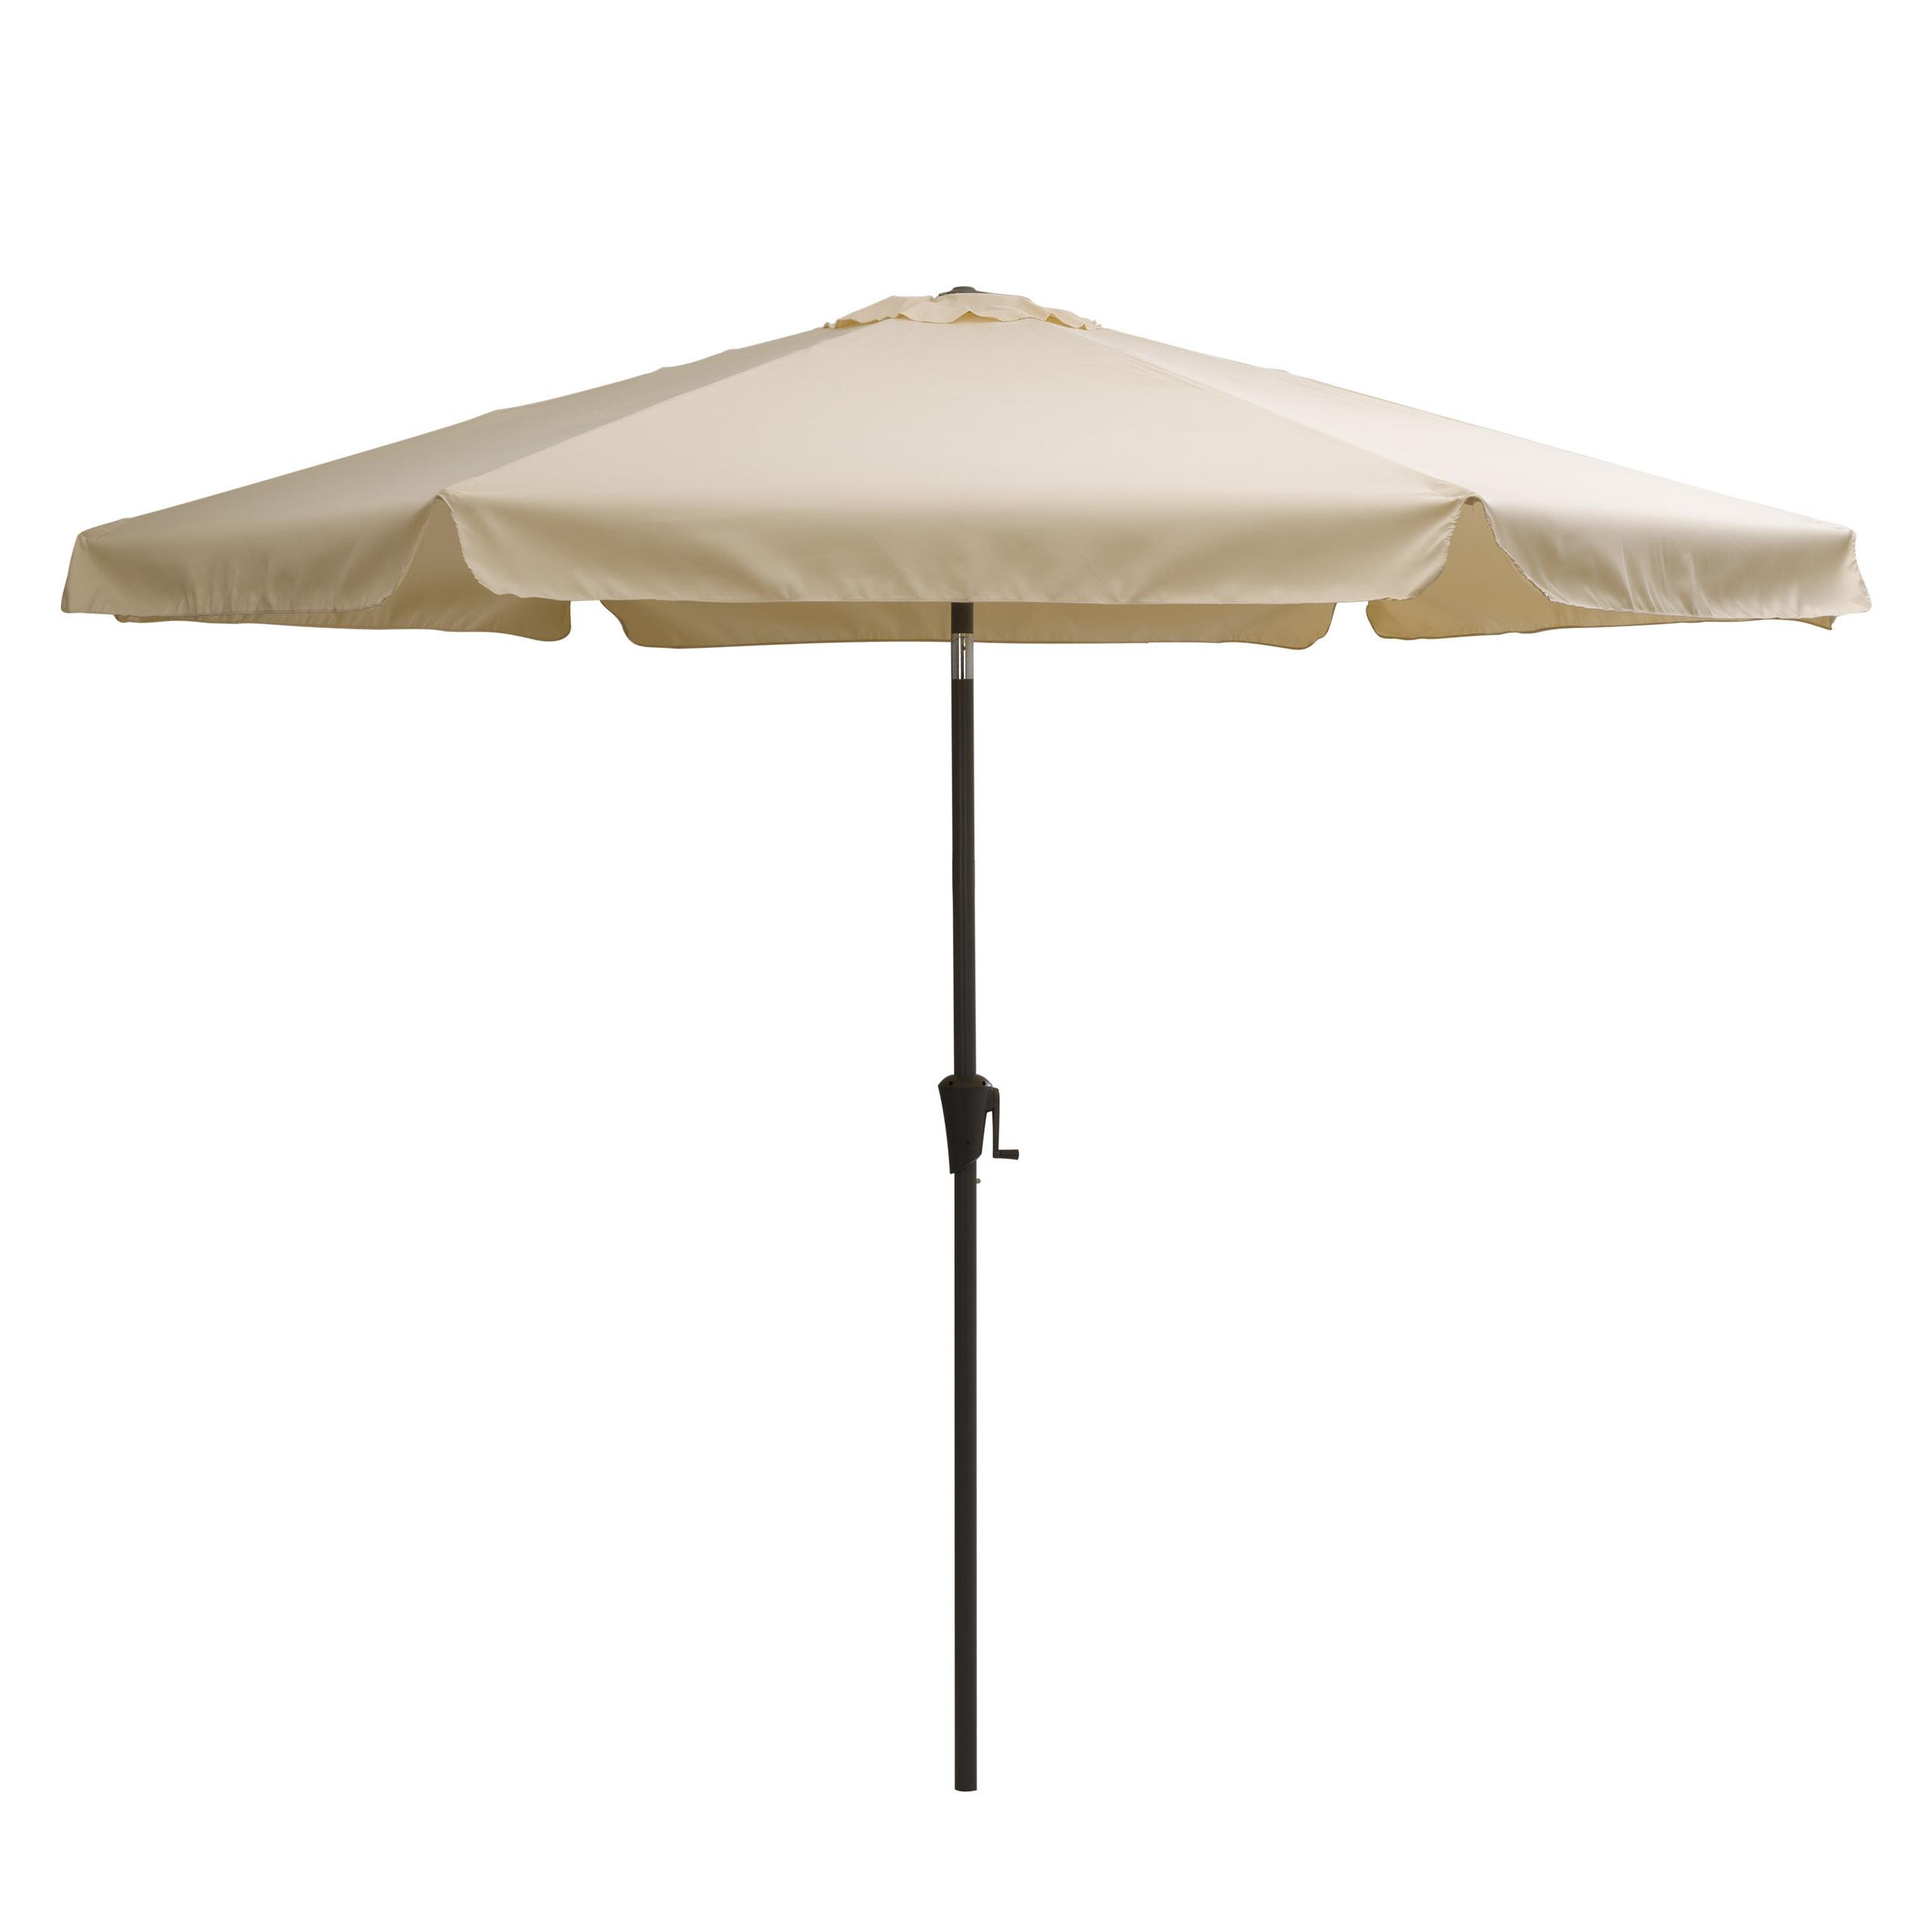 Crowborough 10' Market Umbrella Intended For Newest Crowborough Square Market Umbrellas (View 2 of 20)